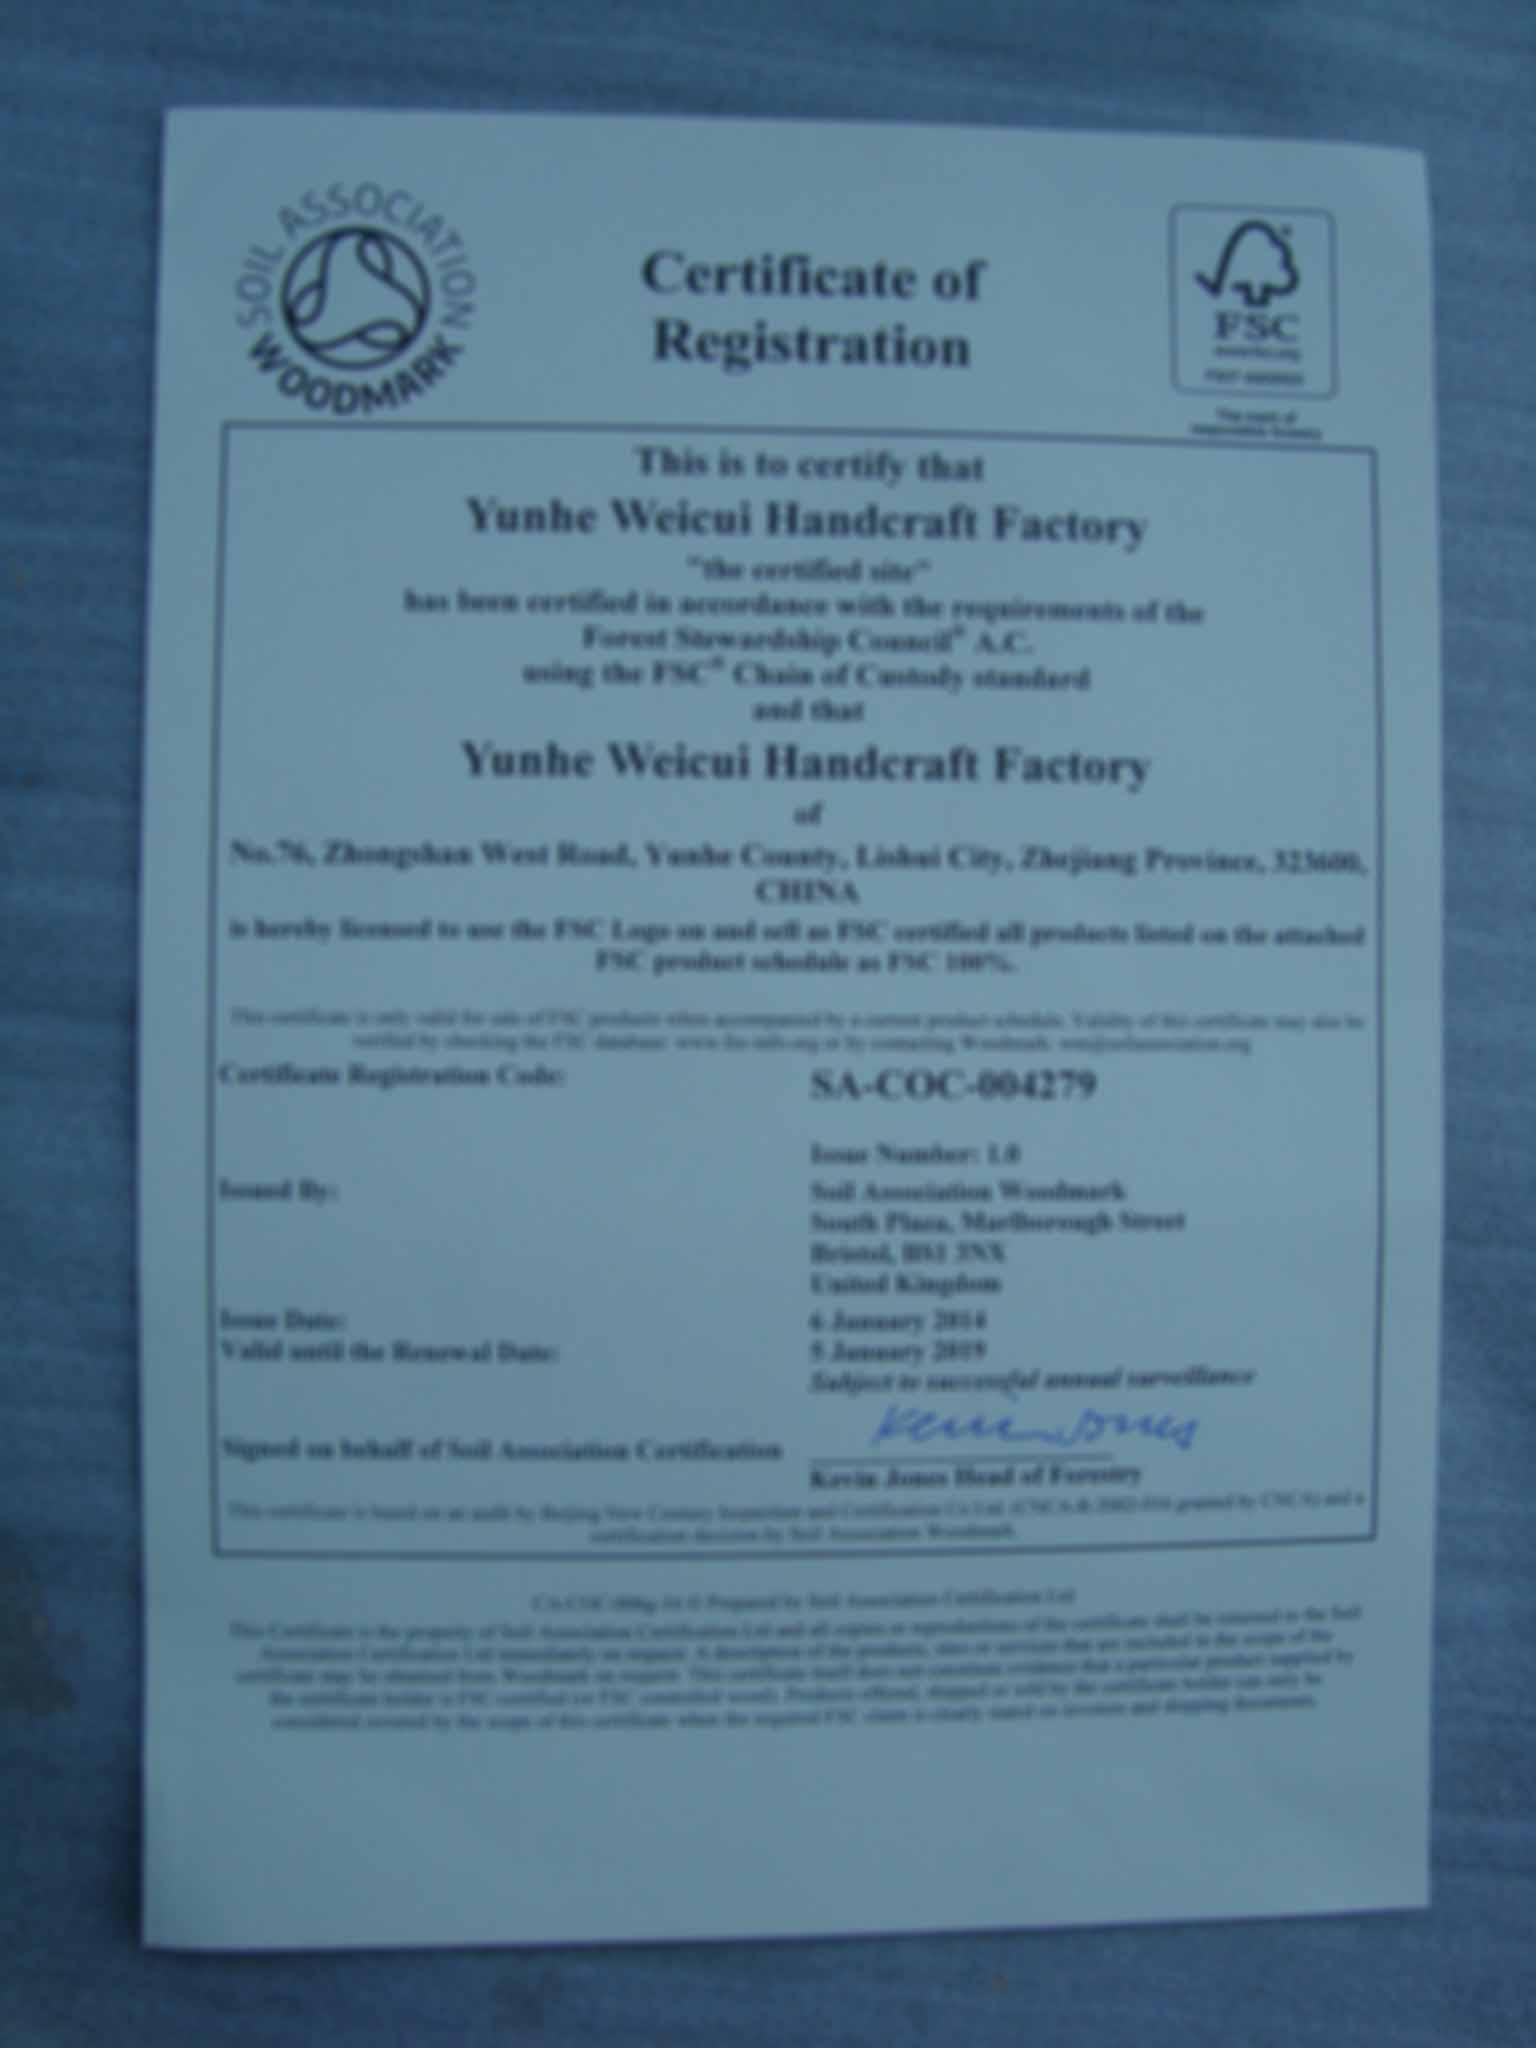 FSC Certificate of wooden toy